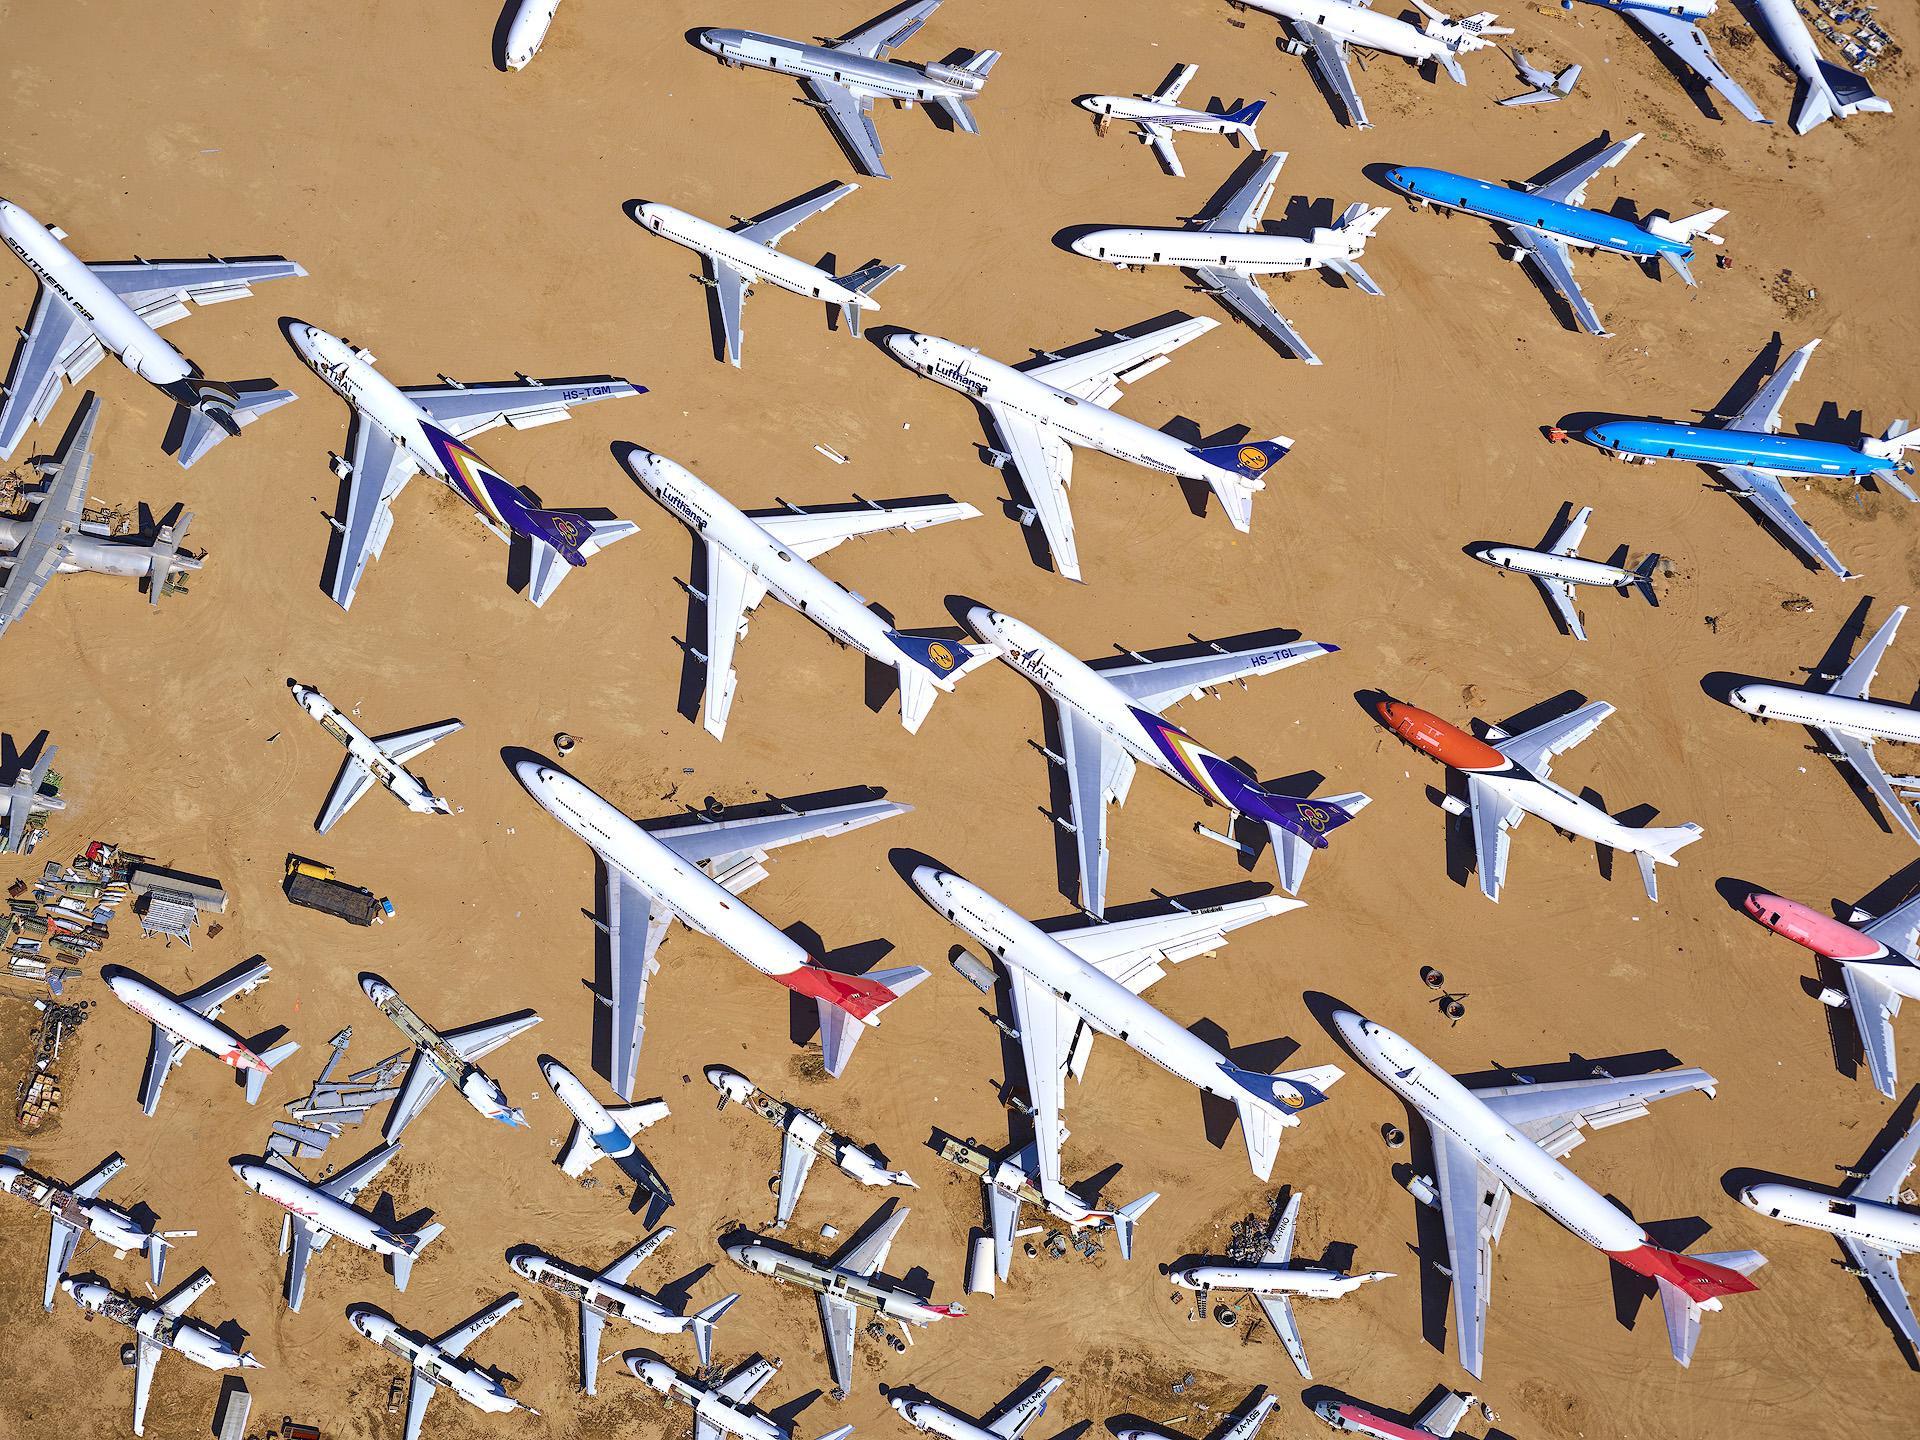 PlanesOnground.jpg